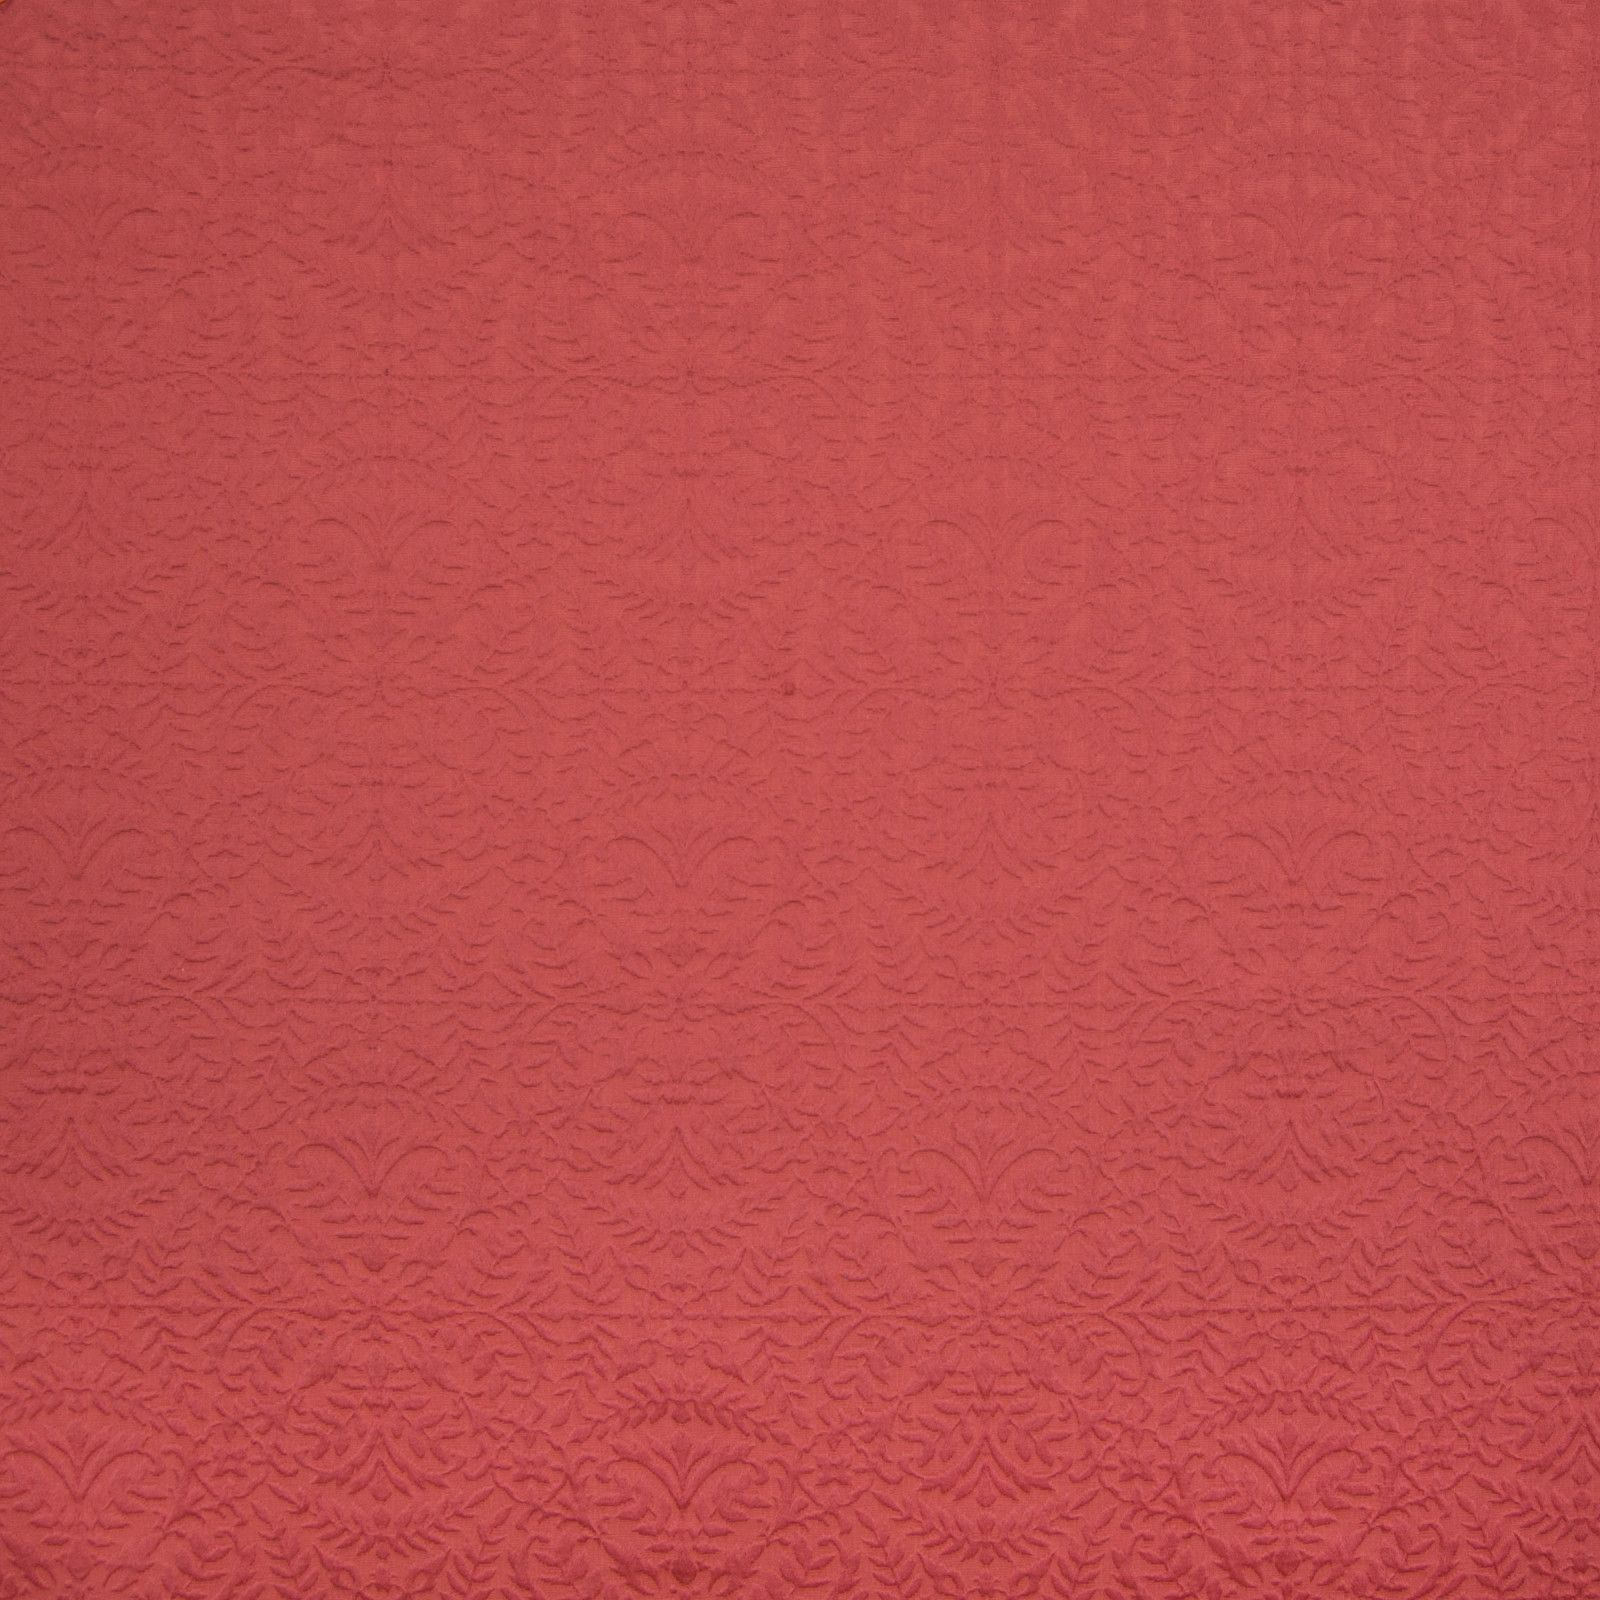 B6651 Jewel Greenhouse Fabrics Fabric Fabric Patterns